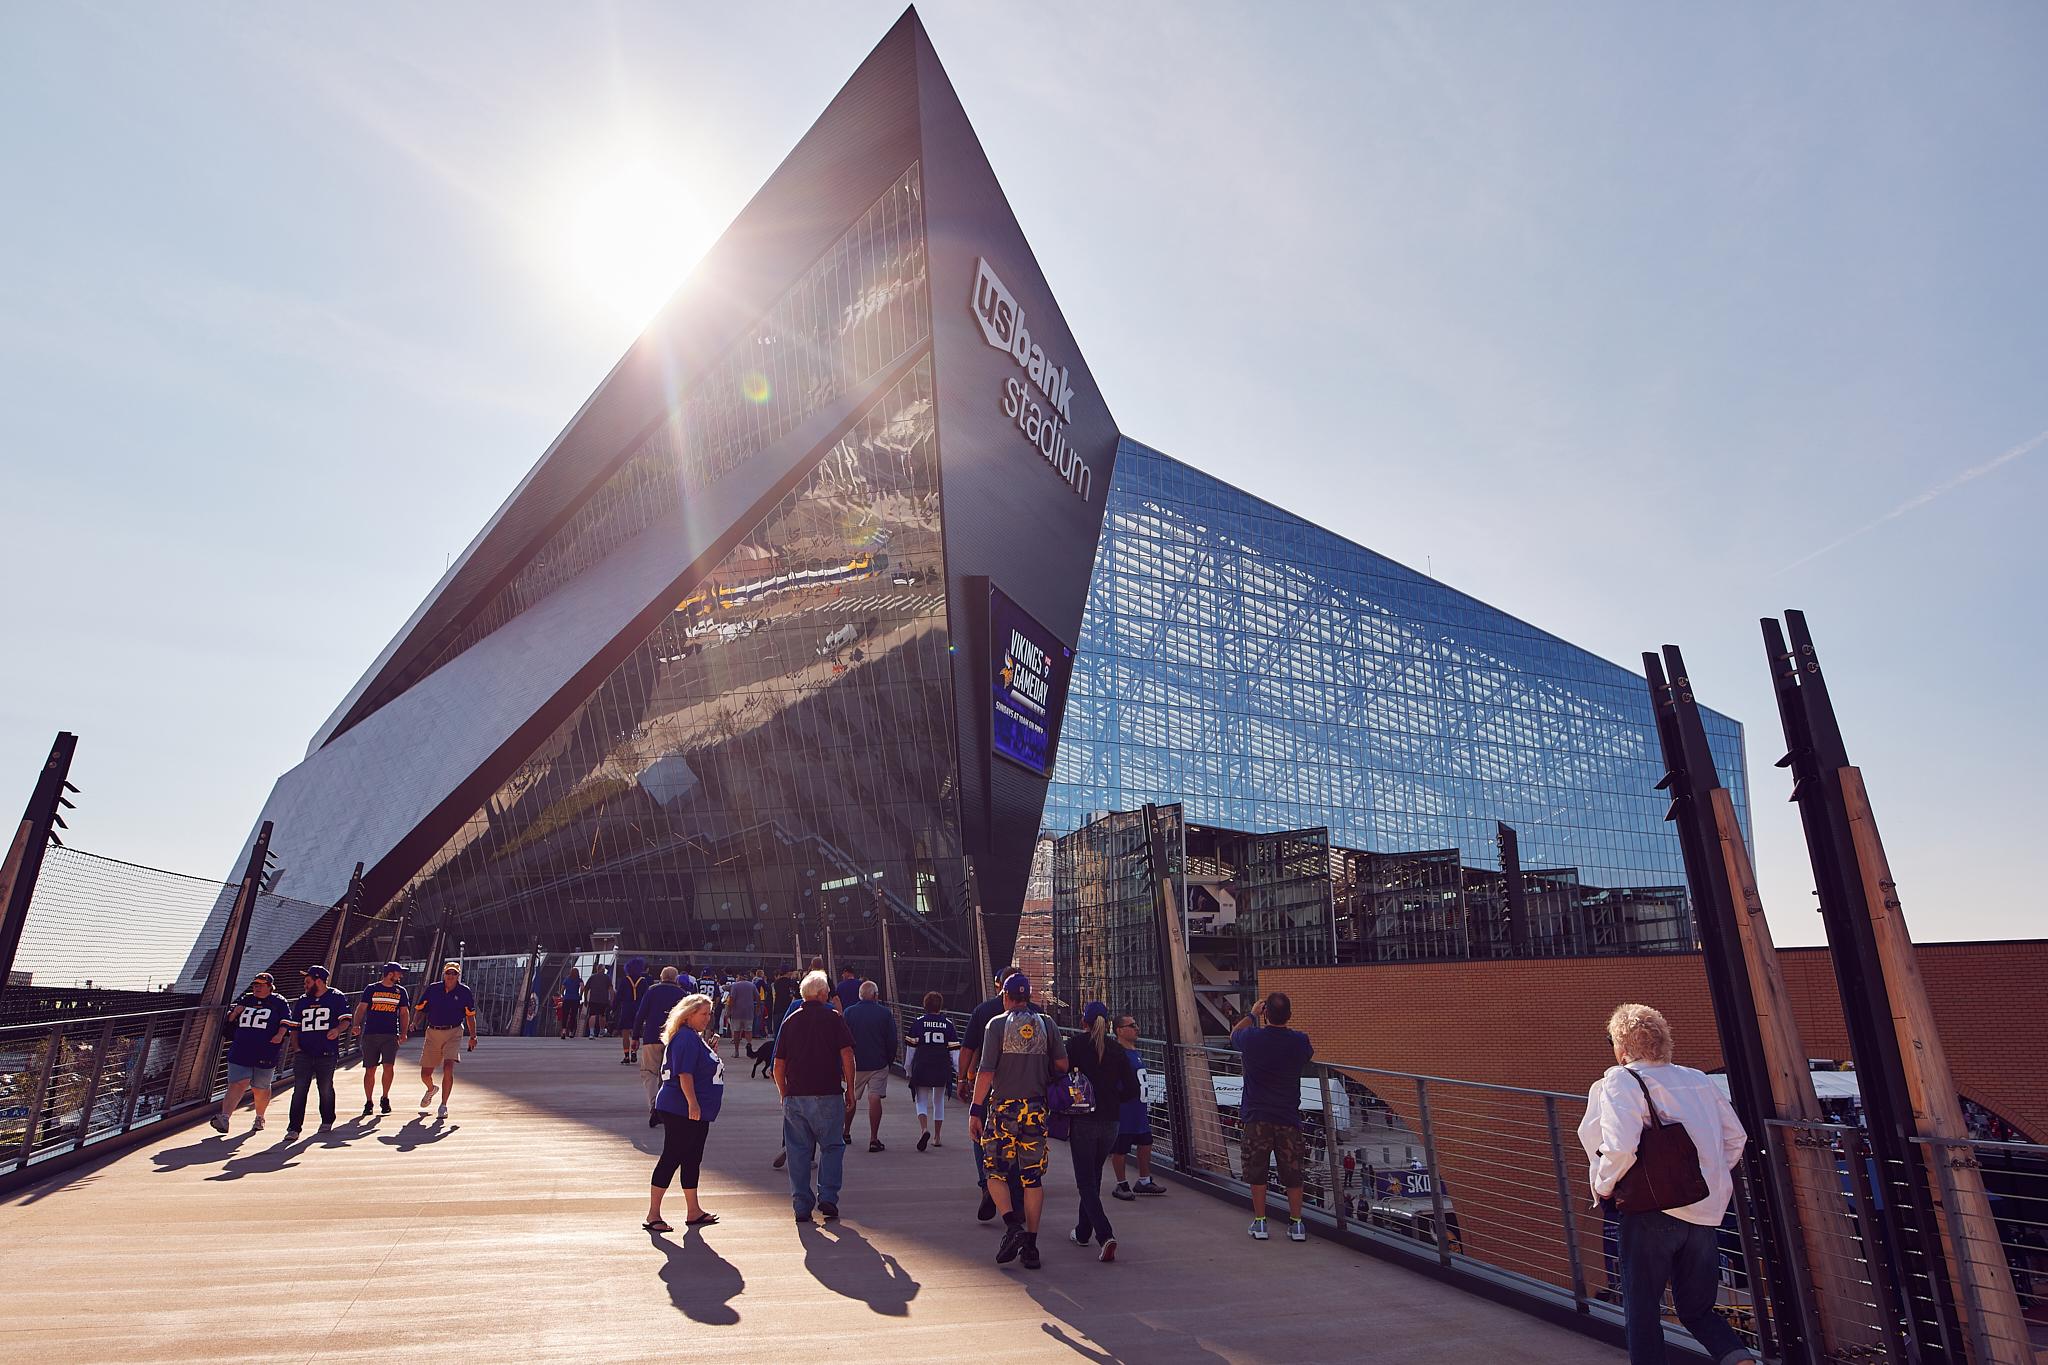 Minnesota_Vikings_Game_US_Bank_Stadium_Minneapolis_Minnesota_Photography_By_Joe_Lemke_052.JPG